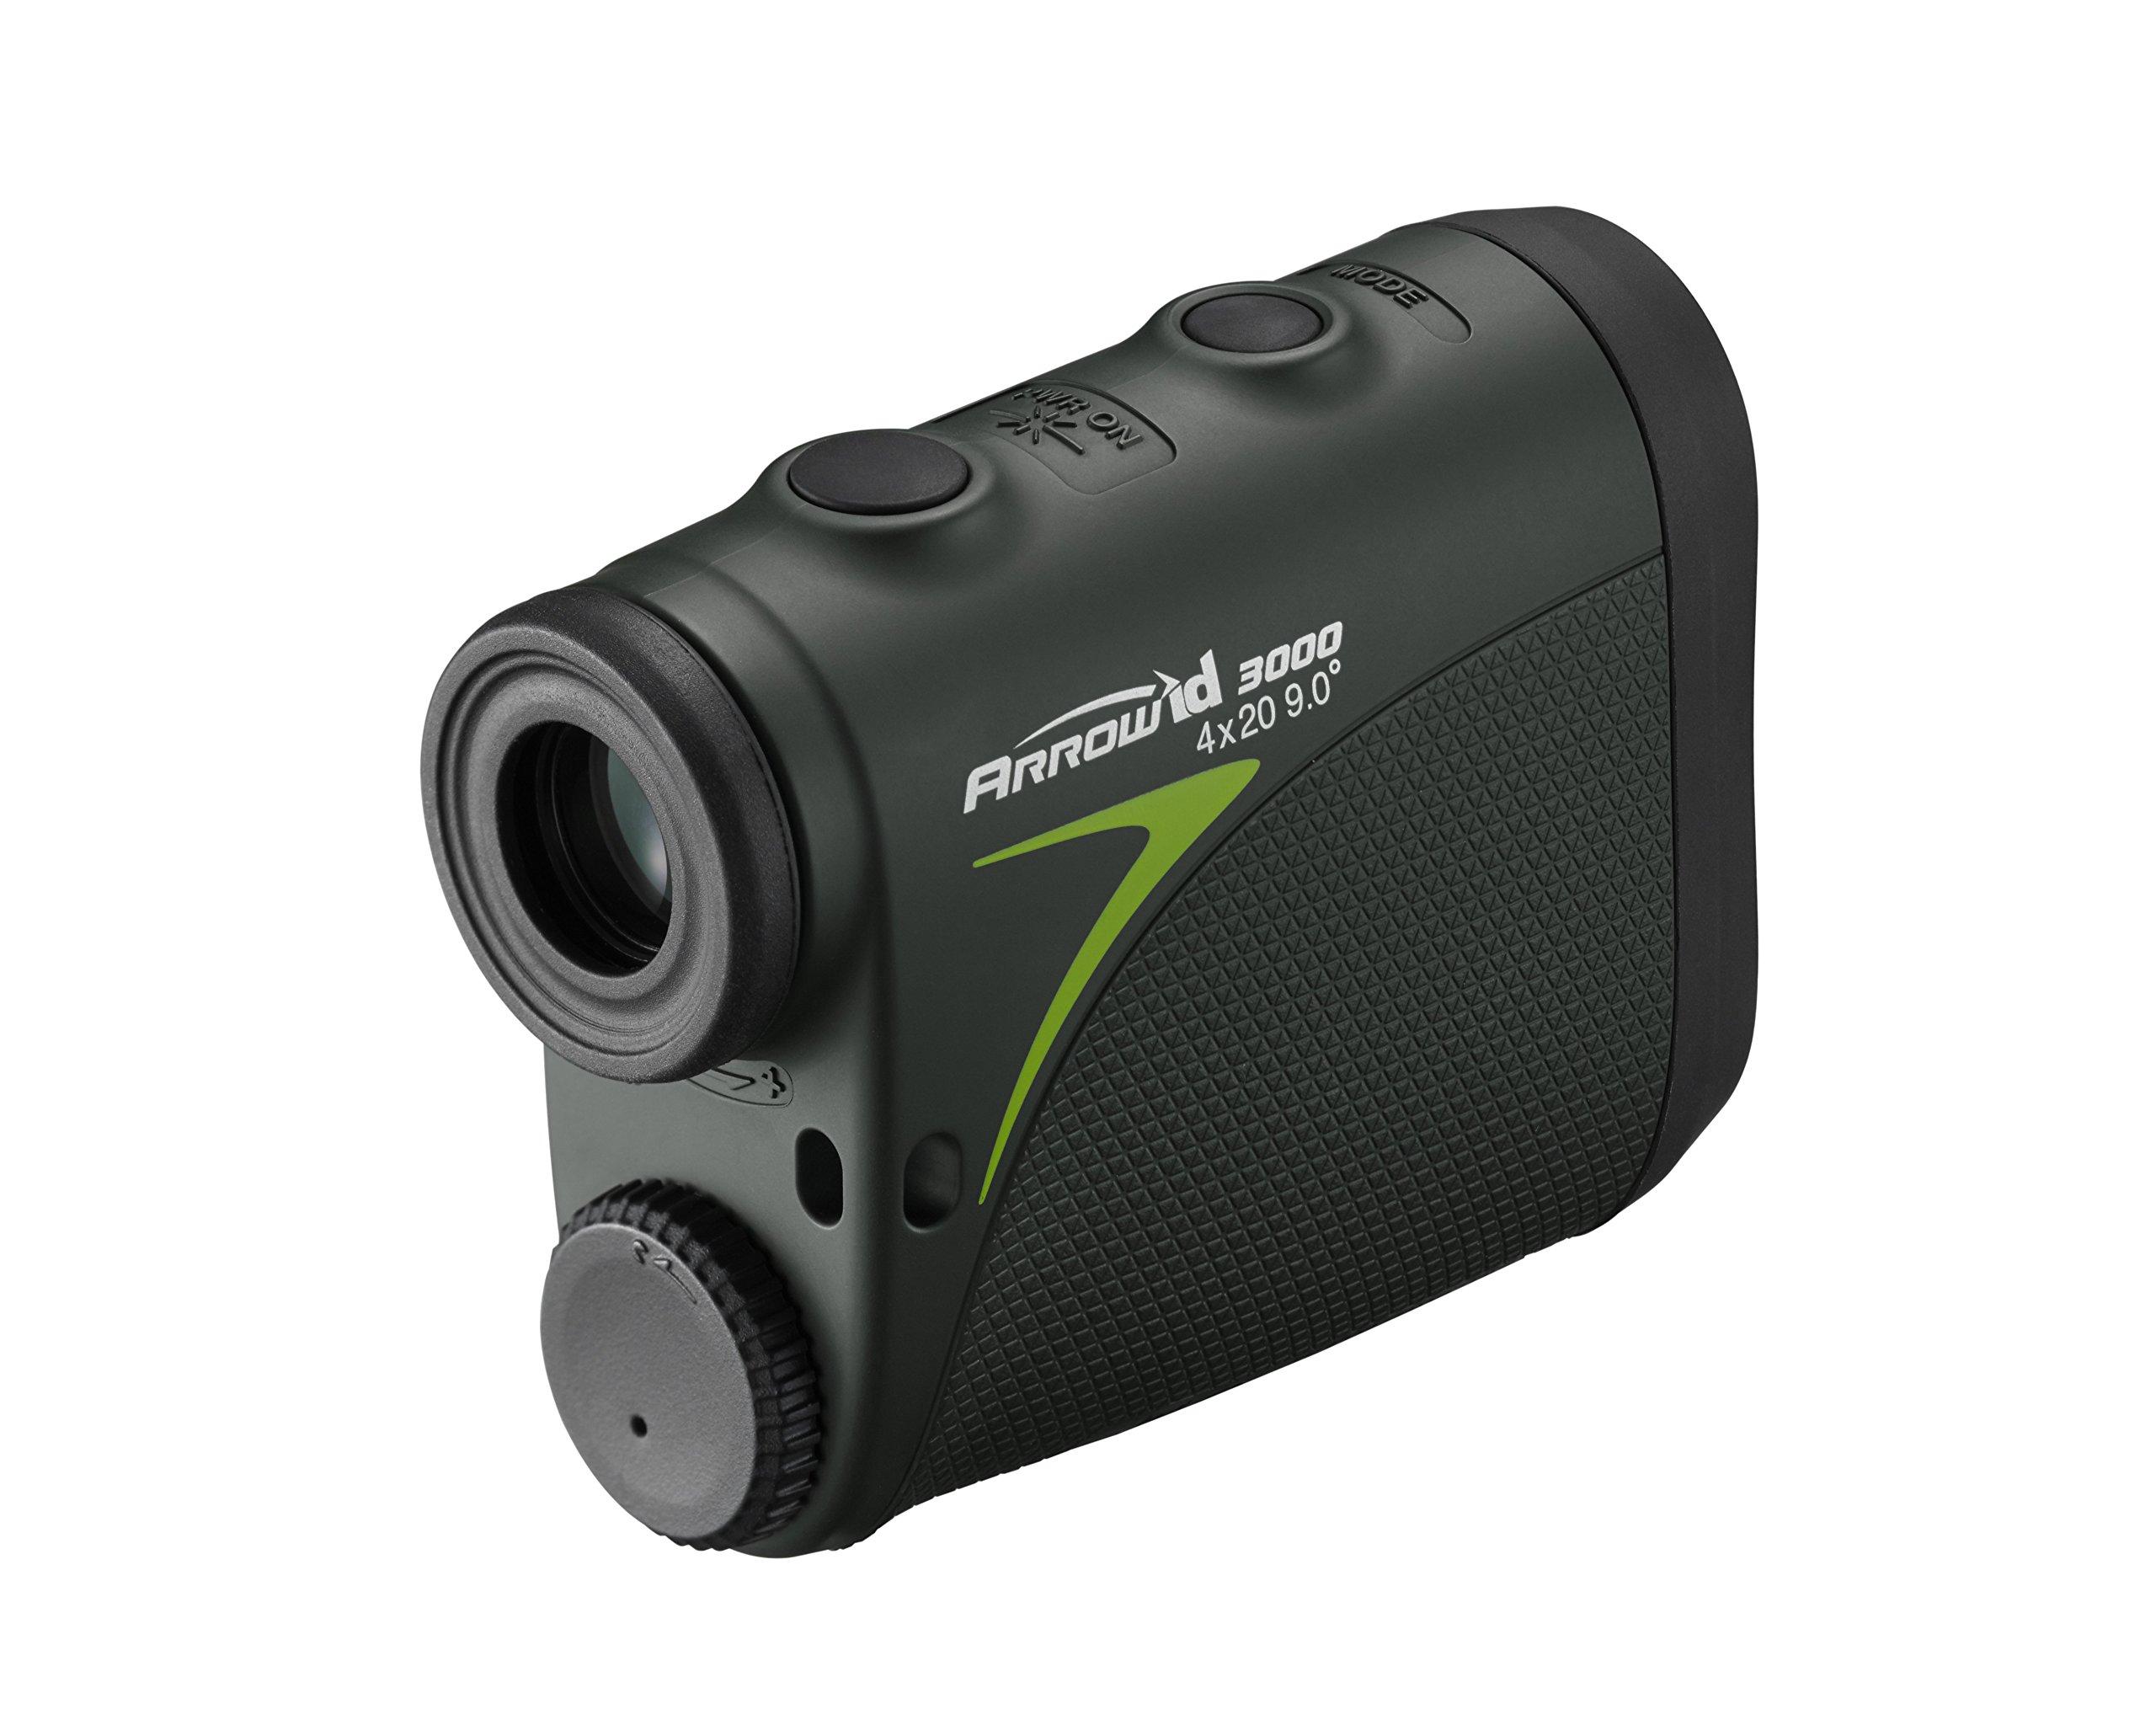 Nikon 16224 Arrow ID 3000 Bowhunting Laser Rangefinder by Nikon (Image #3)